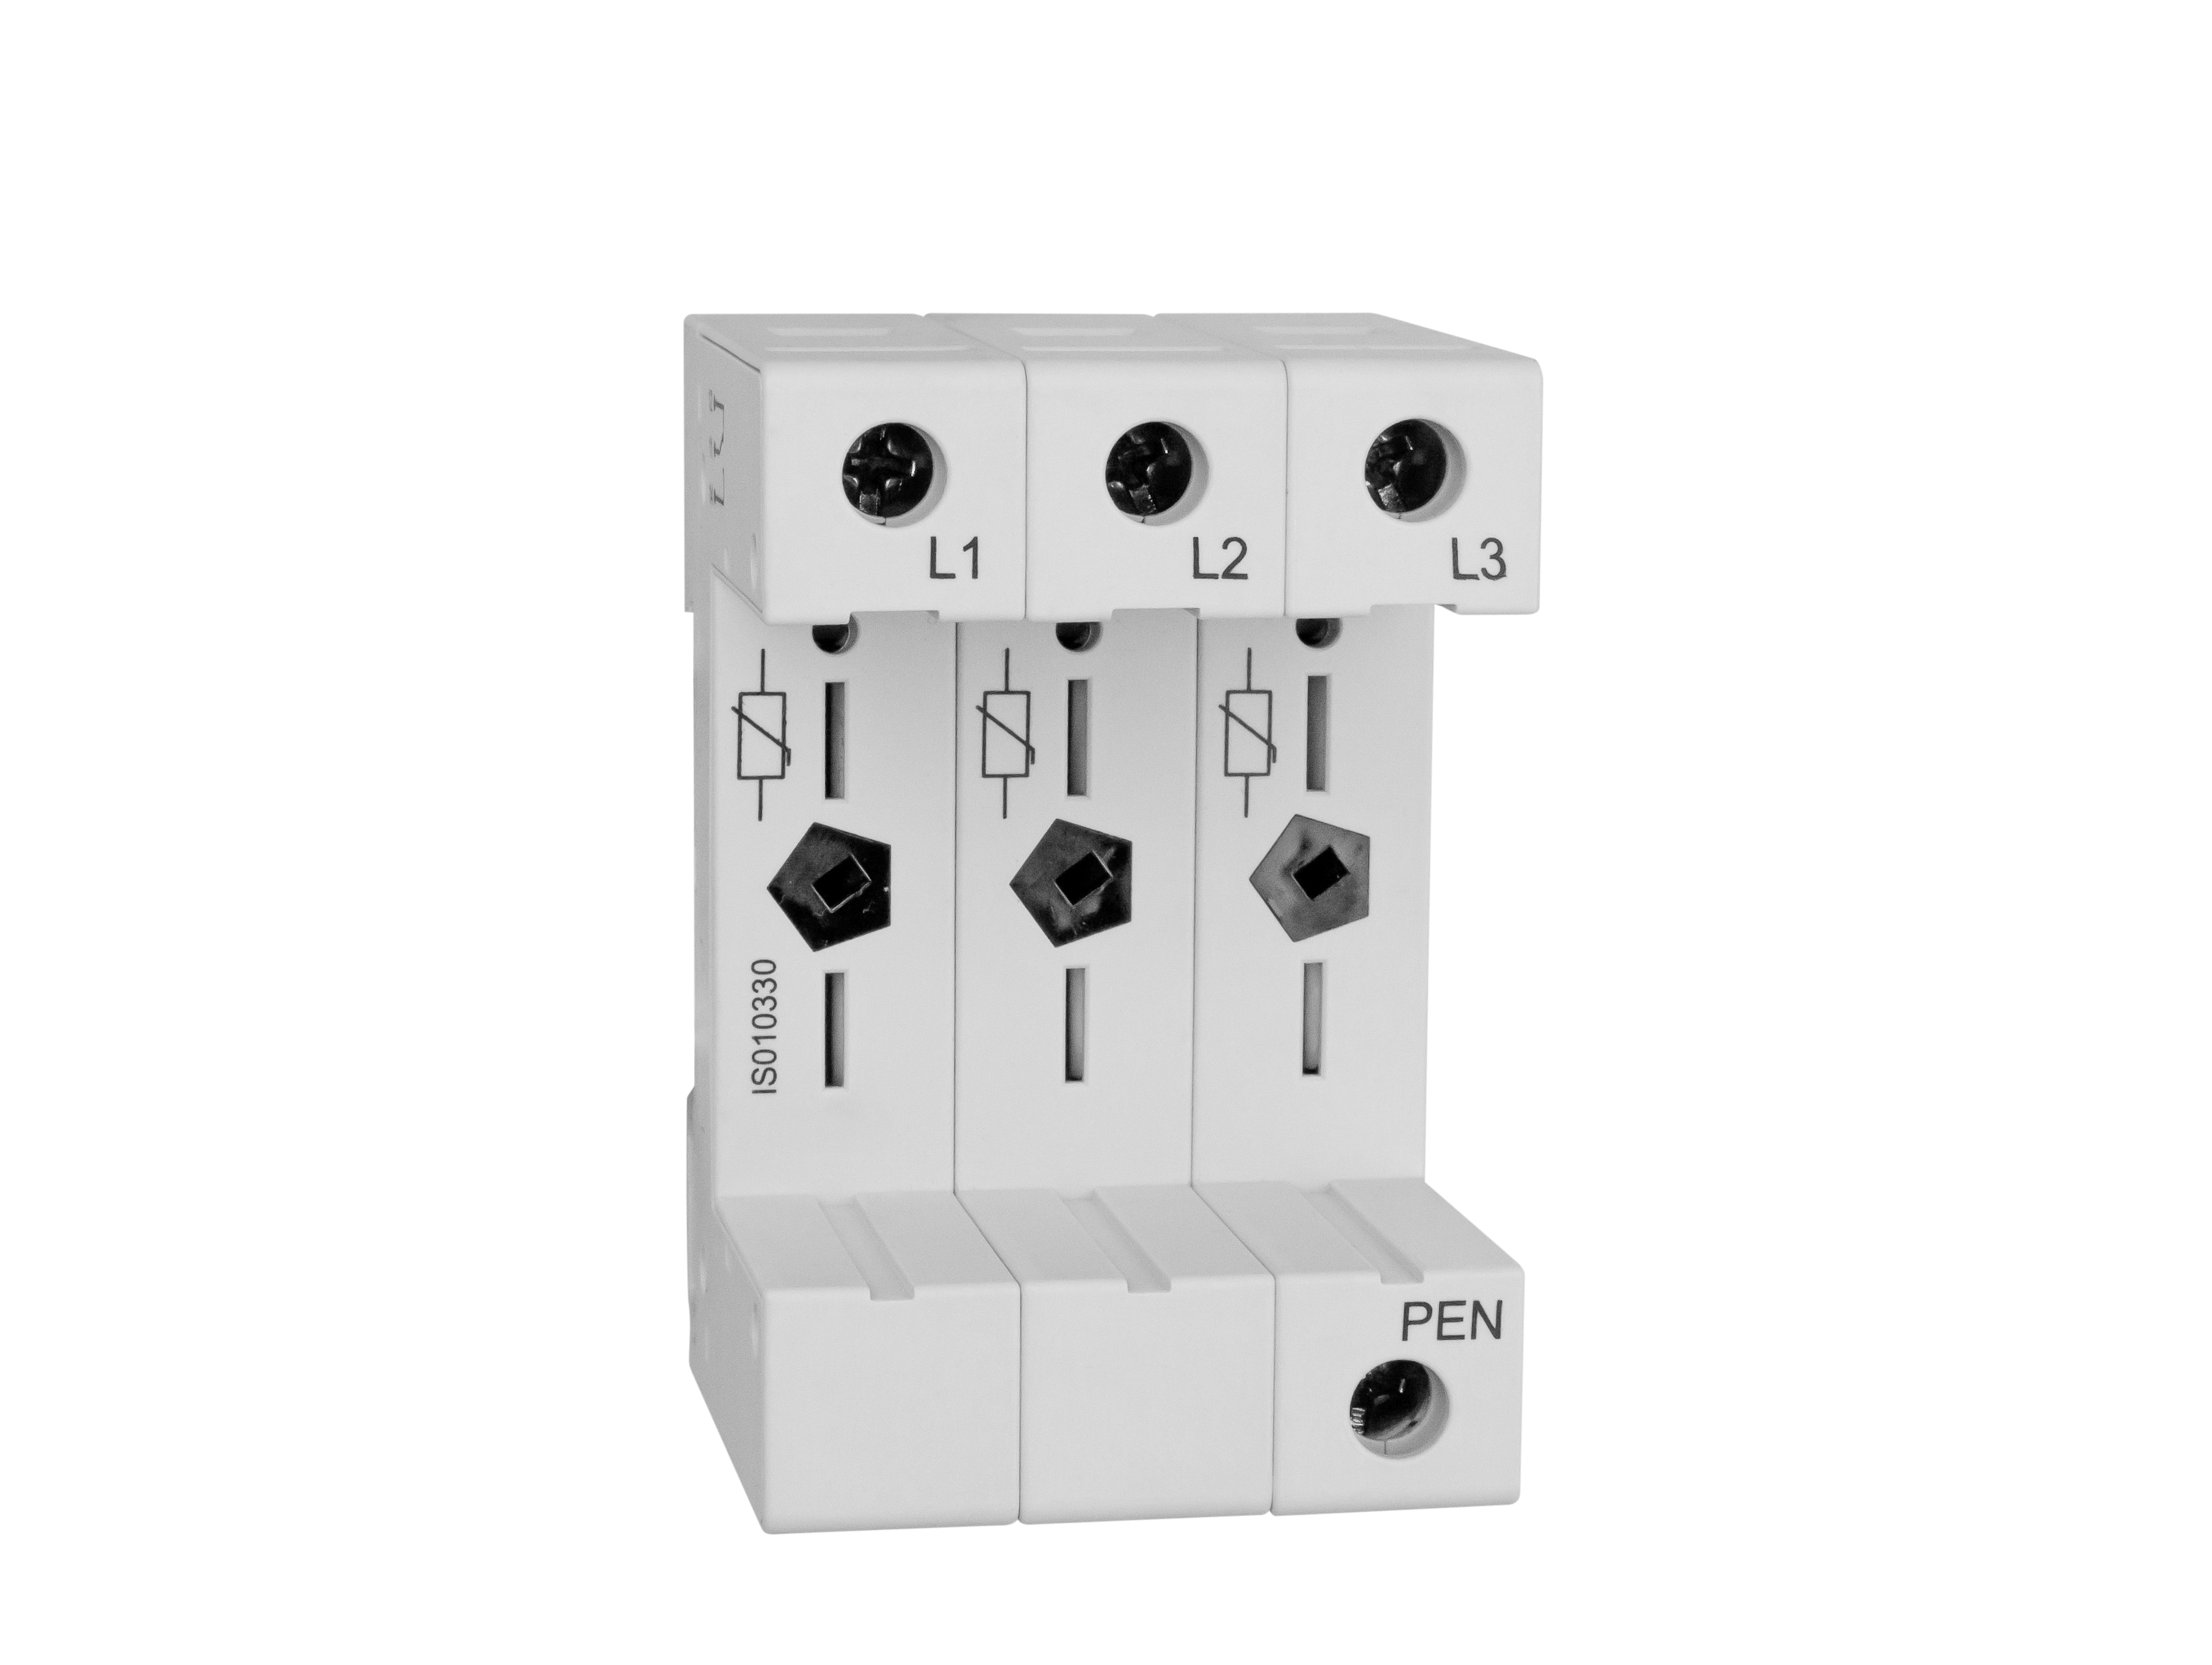 1 Stk Vartec TII, Sockel 3+0 (für 3 VVM), ohne Hilfskontakt IS010330--